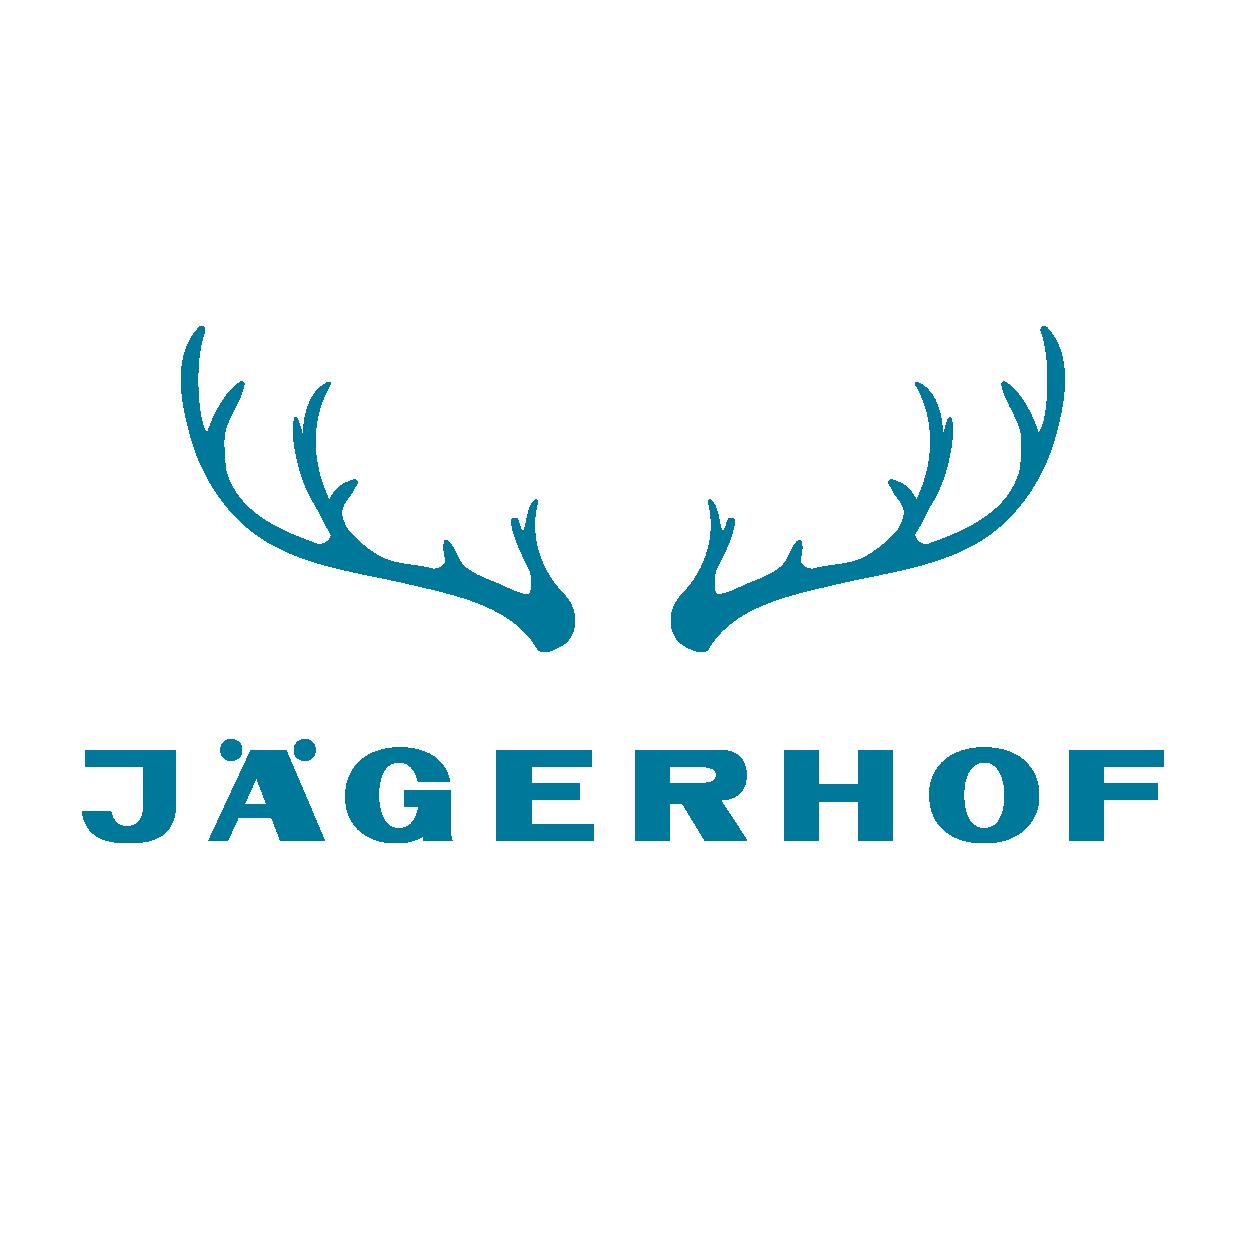 Physiotherapie Logo, Physiotherapie im Jägerhof, Physio Logo, Logodesign, Logoentwurf, Logos, Referenz